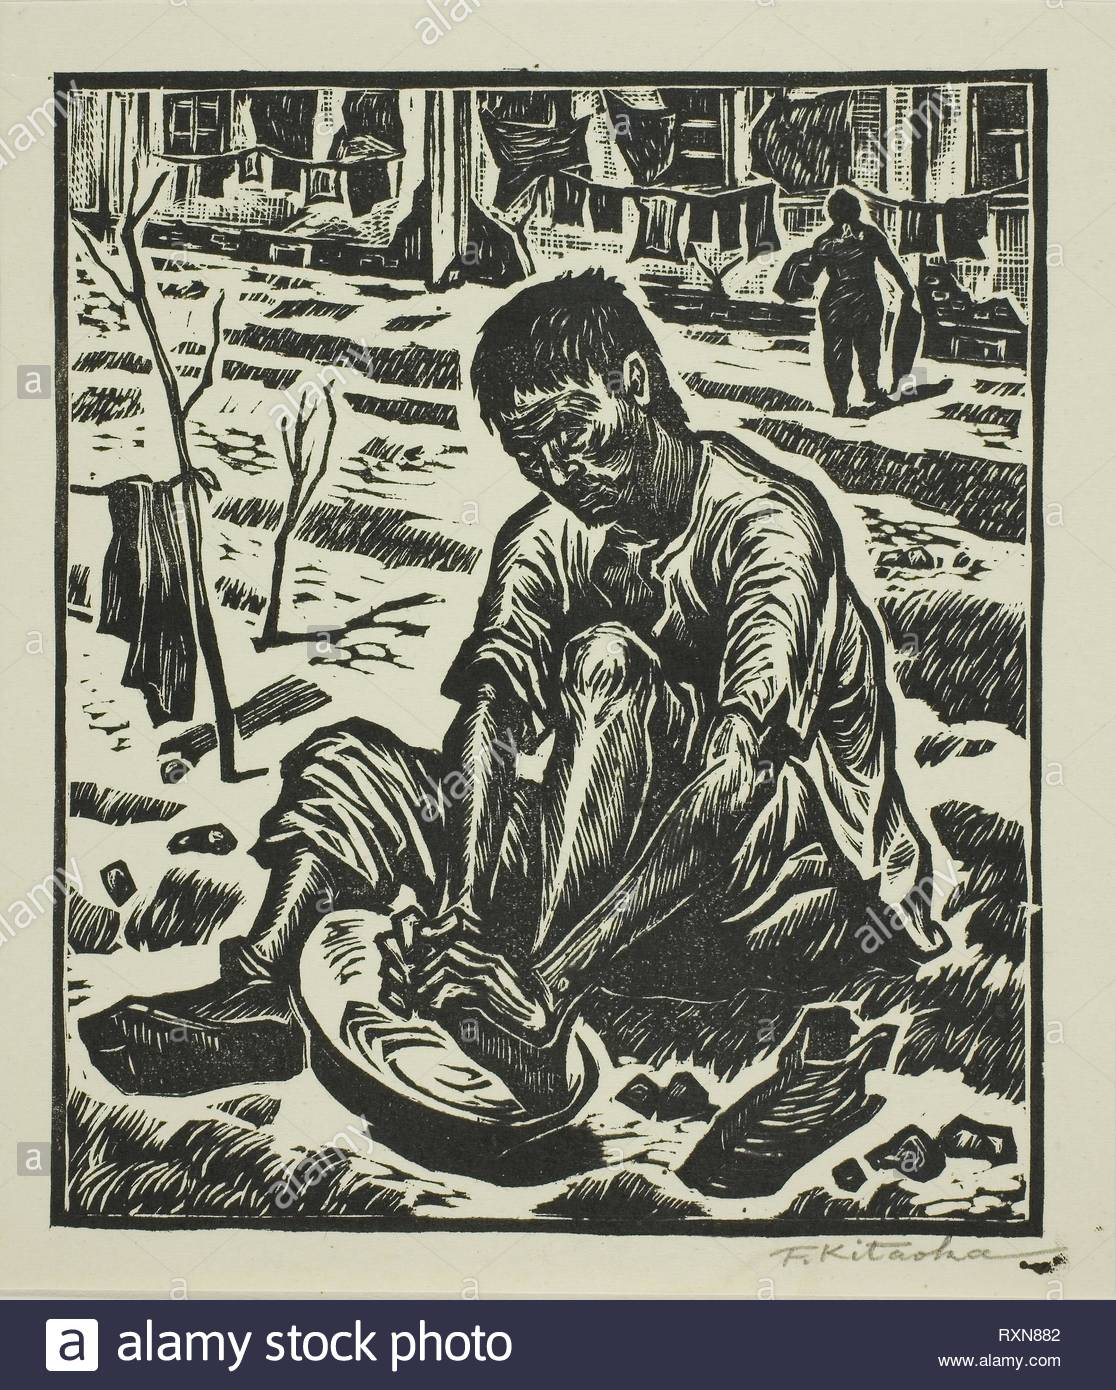 Washing Feet (Ashi o arau), from the series 'Journey to the Homeland (Sokoku e no tabi)'. Kitaoka Fumio; Japanese, 1918-2007. Date: 1947. Dimensions: 19.7 x 17.1 cm (7 3/4 x 6 11/16 in.). Woodblock print. Origin: Japan. Museum: The Chicago Art Institute. - Stock Image